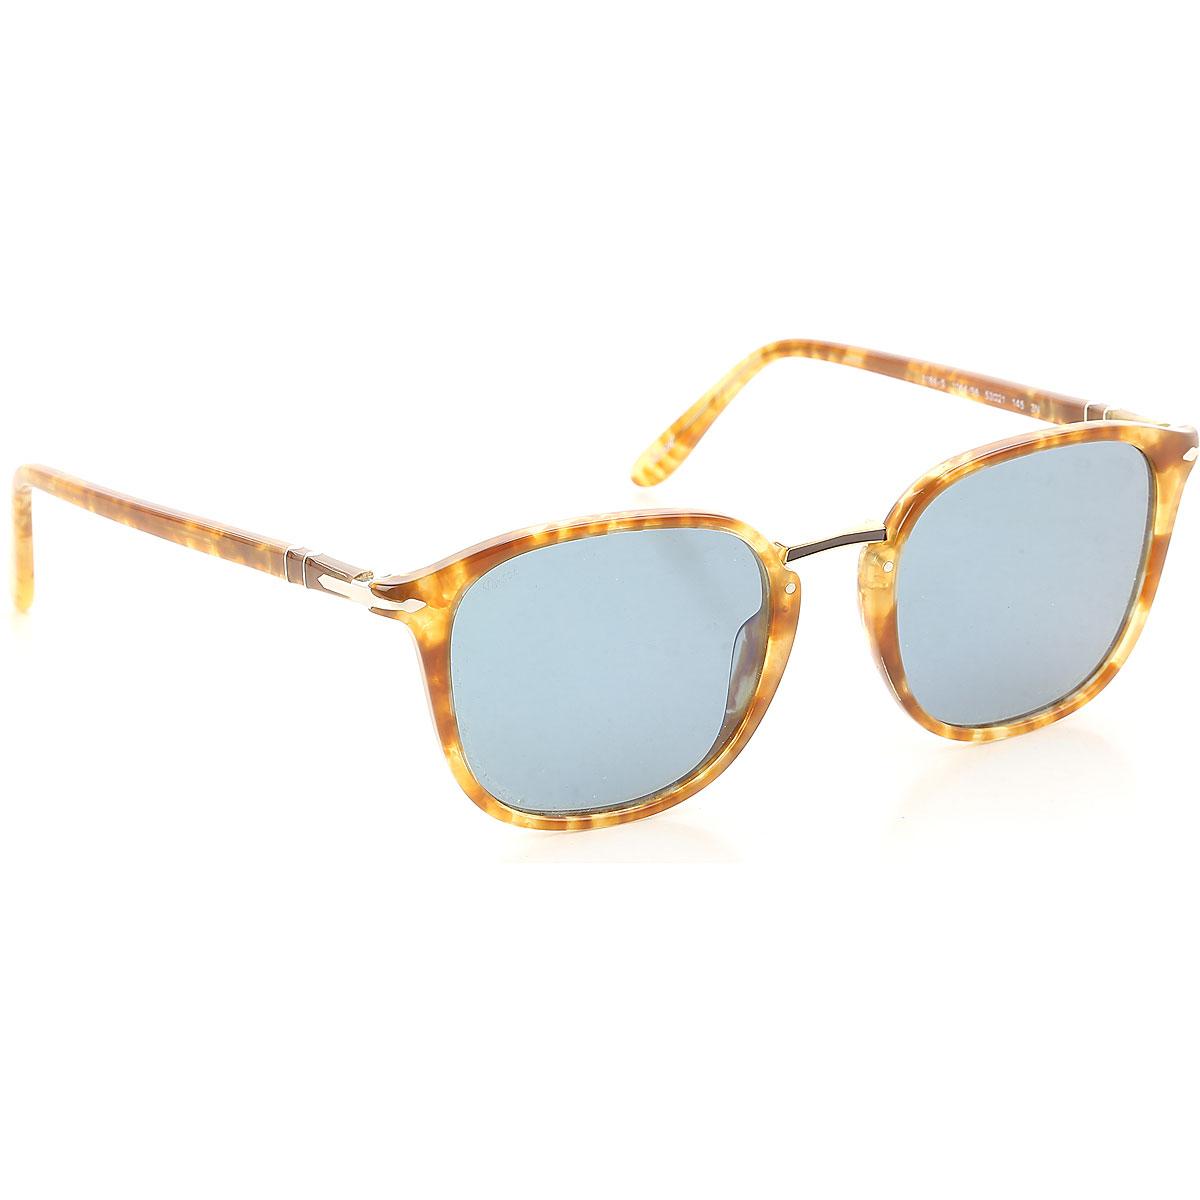 Persol Sunglasses On Sale, Blonde Havana, 2019